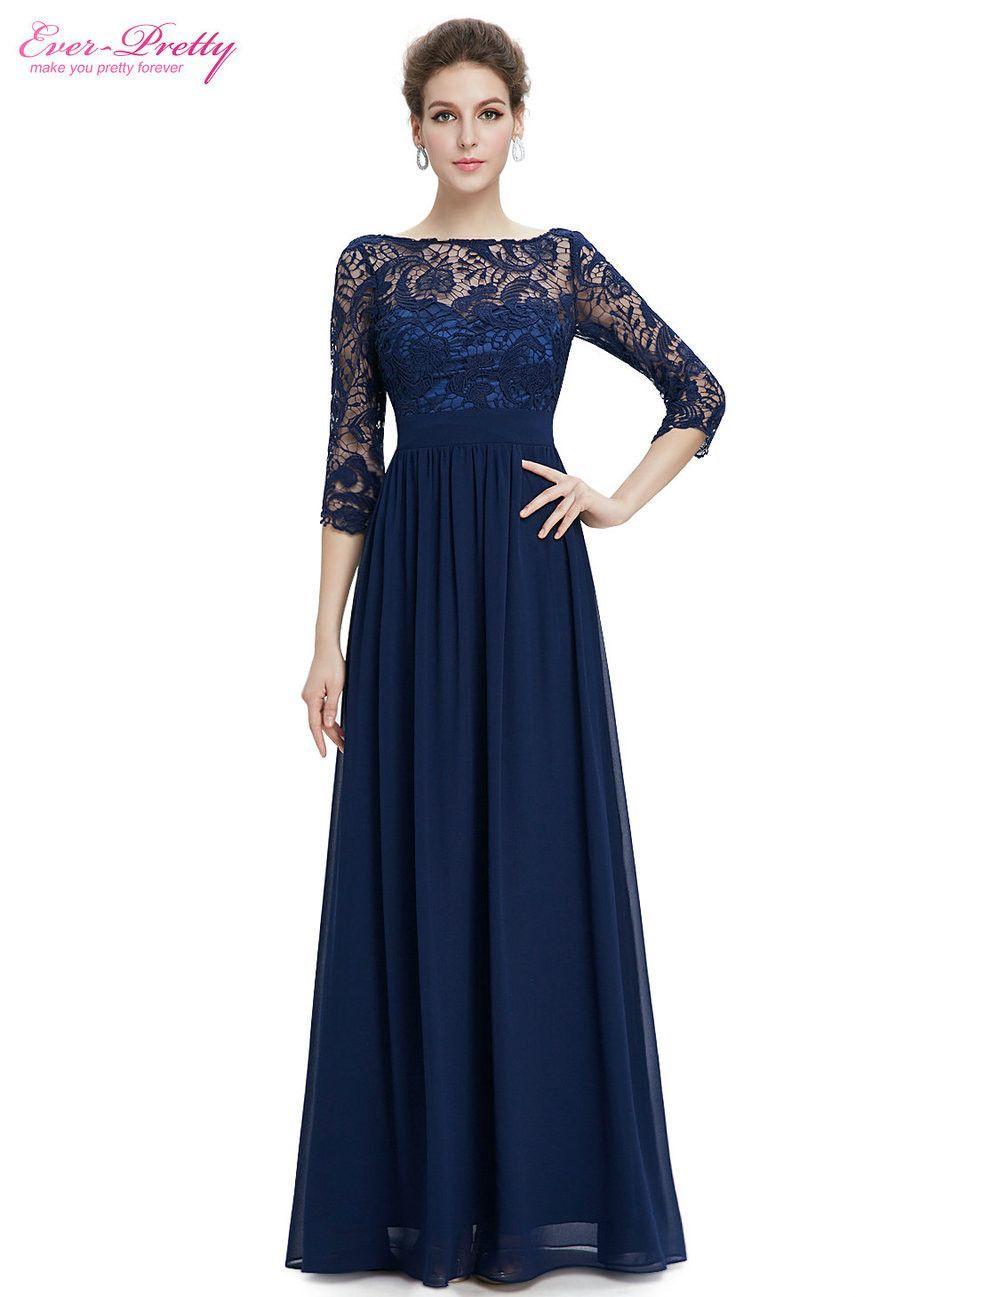 MACloth Women High Neck Lace Chiffon Long Prom Dress Formal Party Ball Gown (EU32, Marfil)